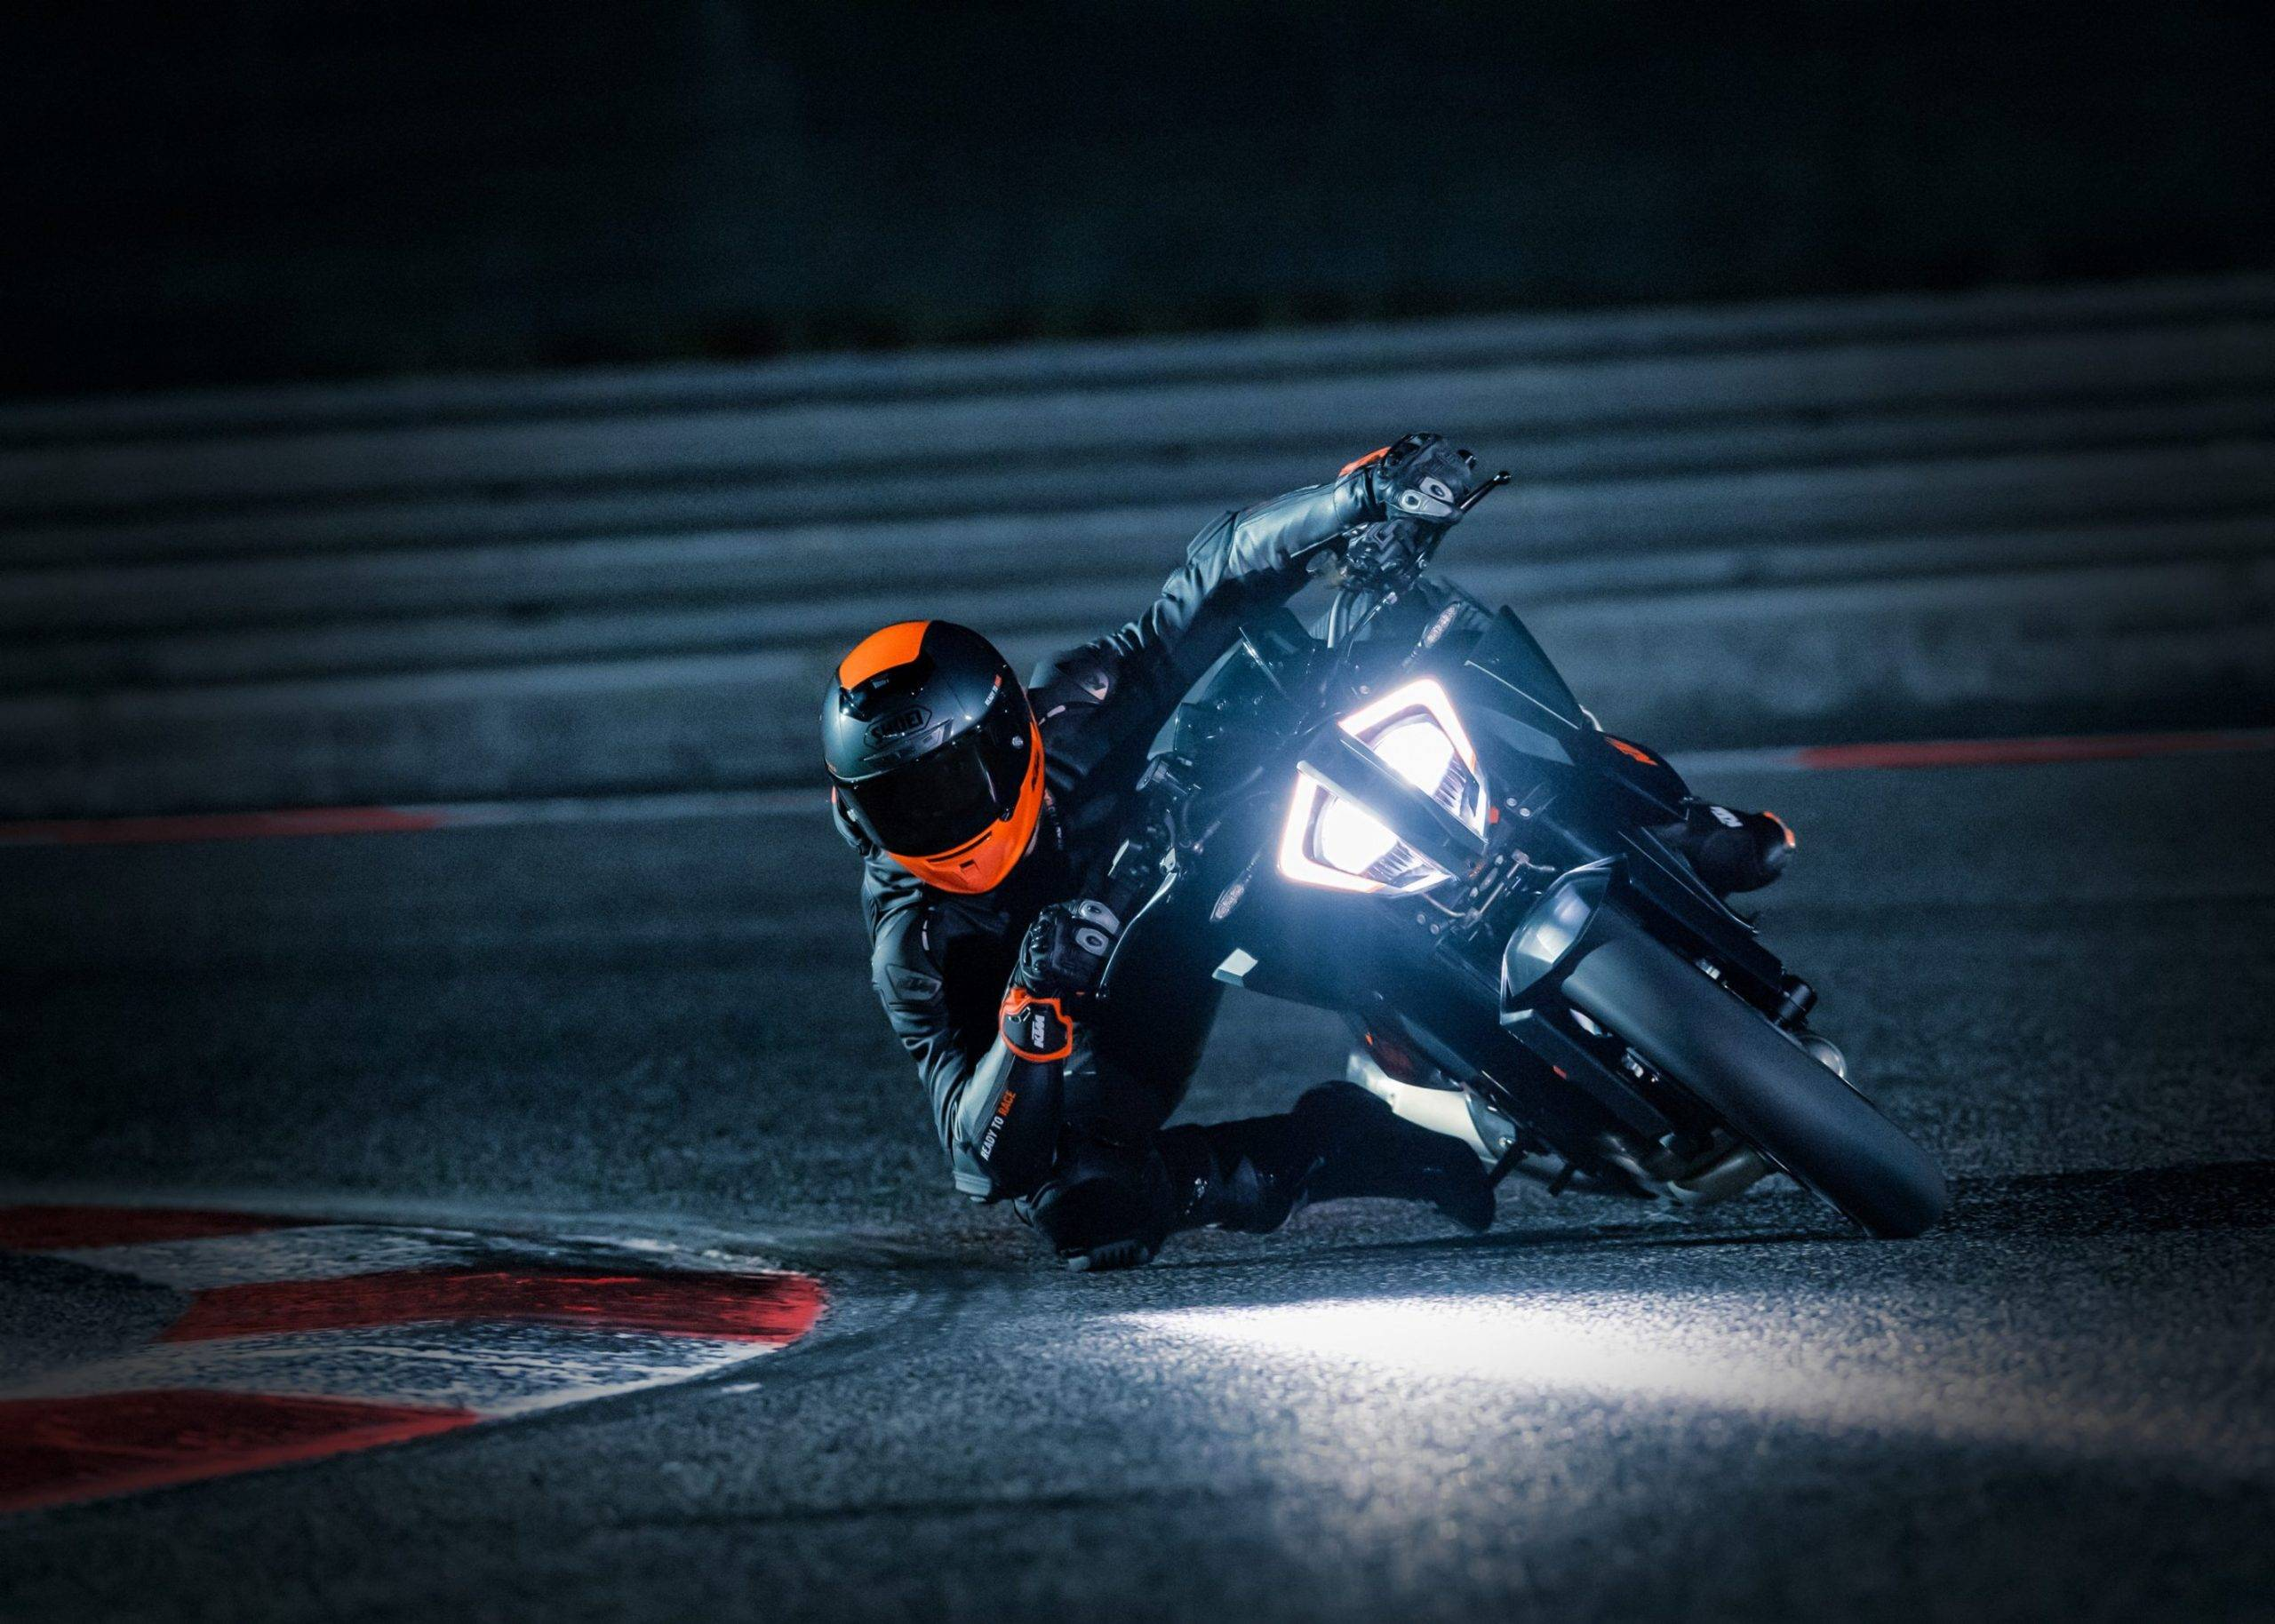 Achat motos KTM neuves Lyon